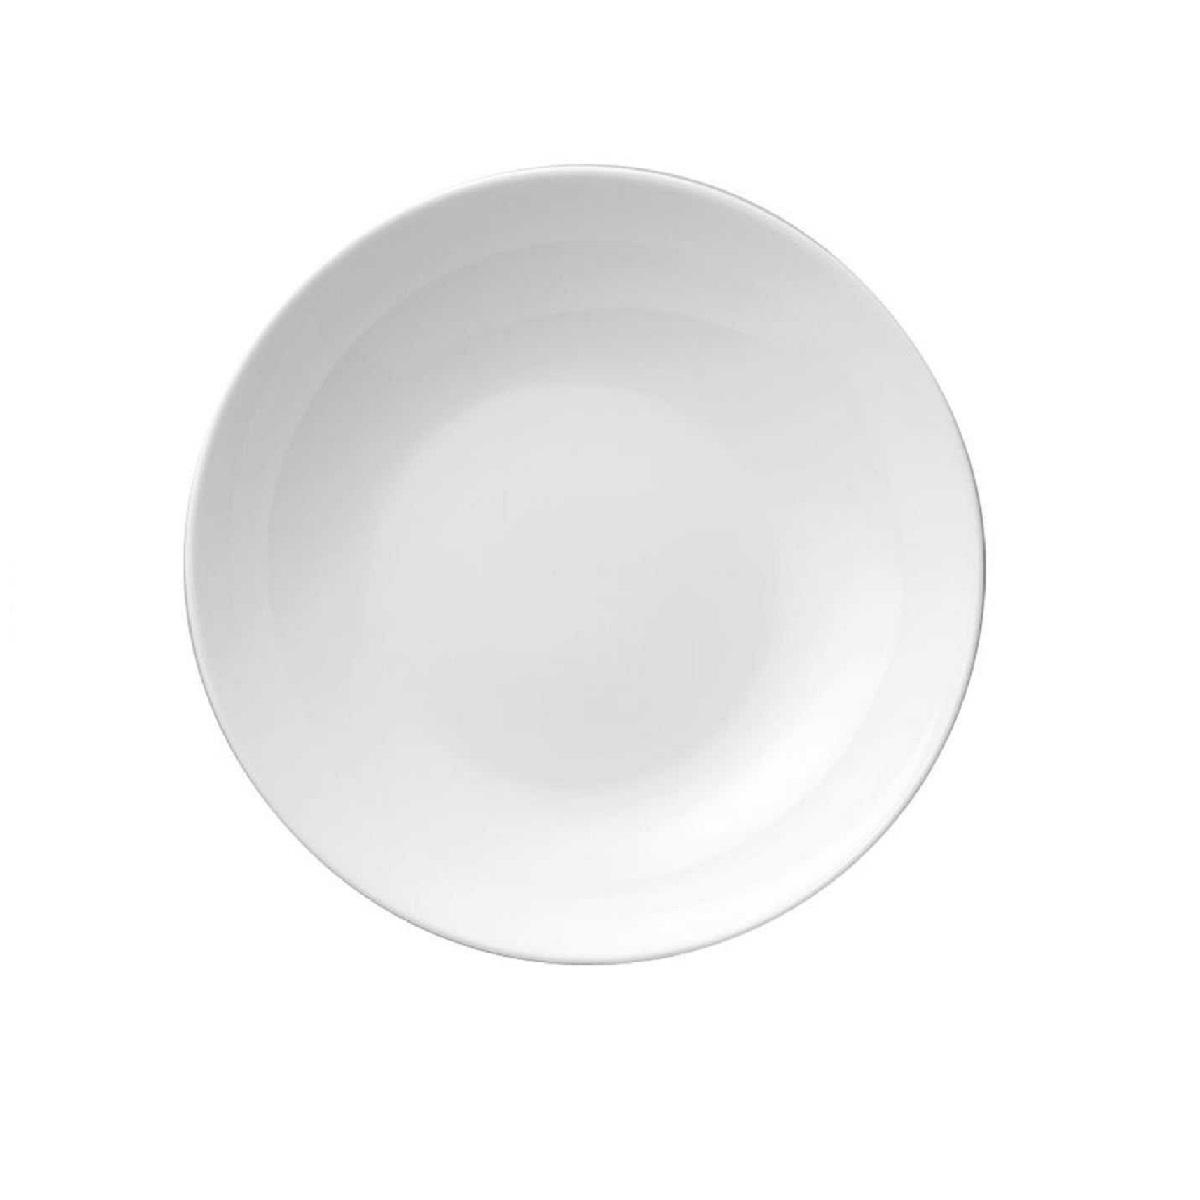 Тарелка глубокая фарфоровая Rosenthal JADE, диаметр 19 см, белый Rosenthal 61040-800001-10319 фото 1